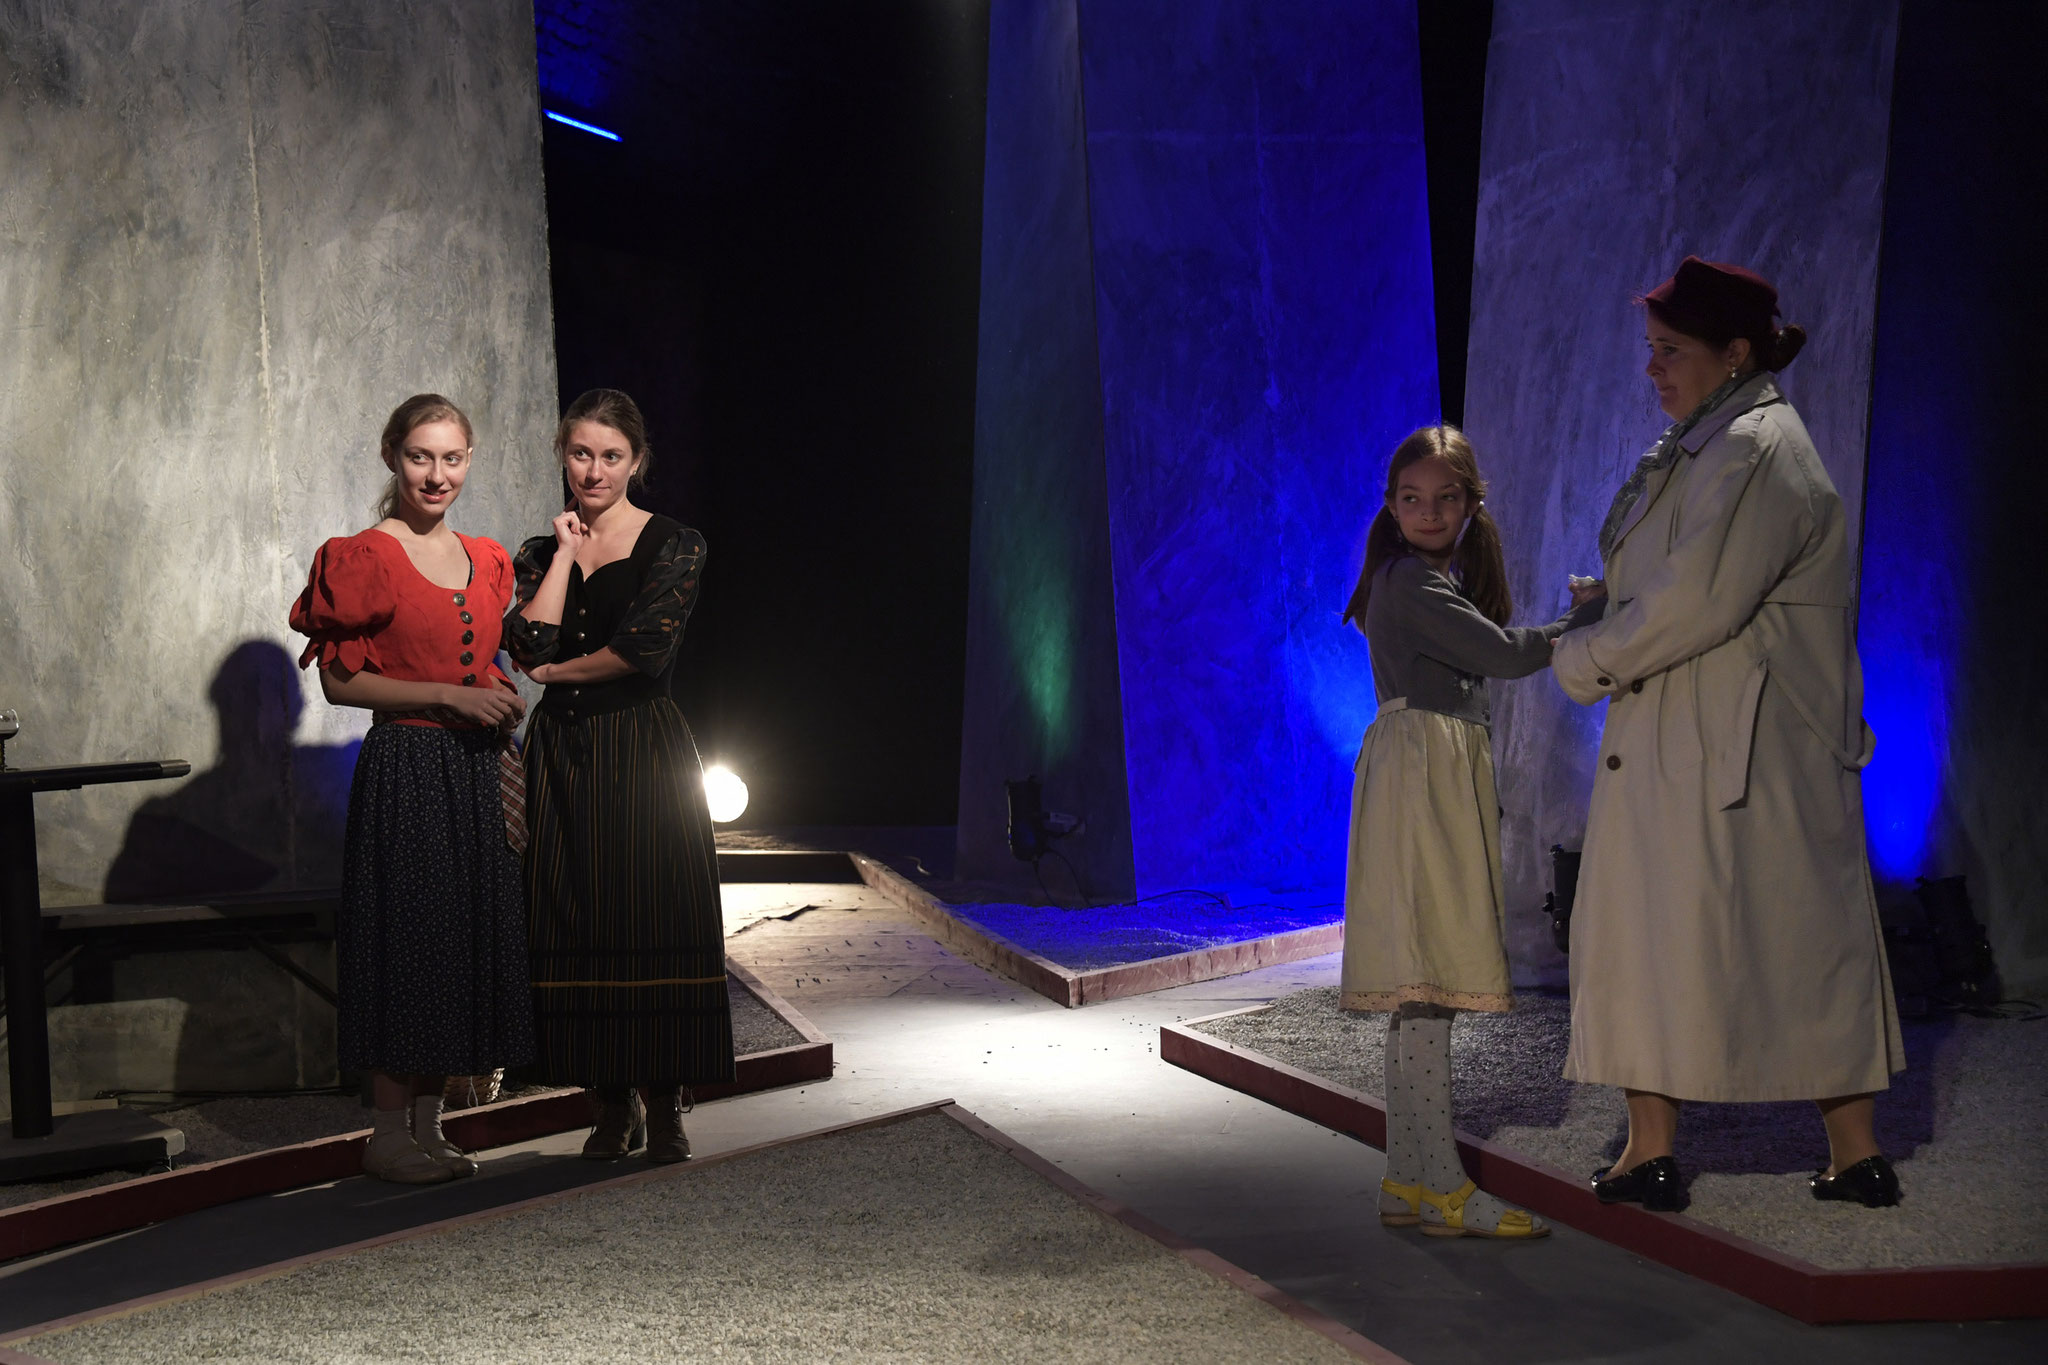 Sabine Wimmer, Barbara Wimmer, Katharina Lintner, Michaela Mekina